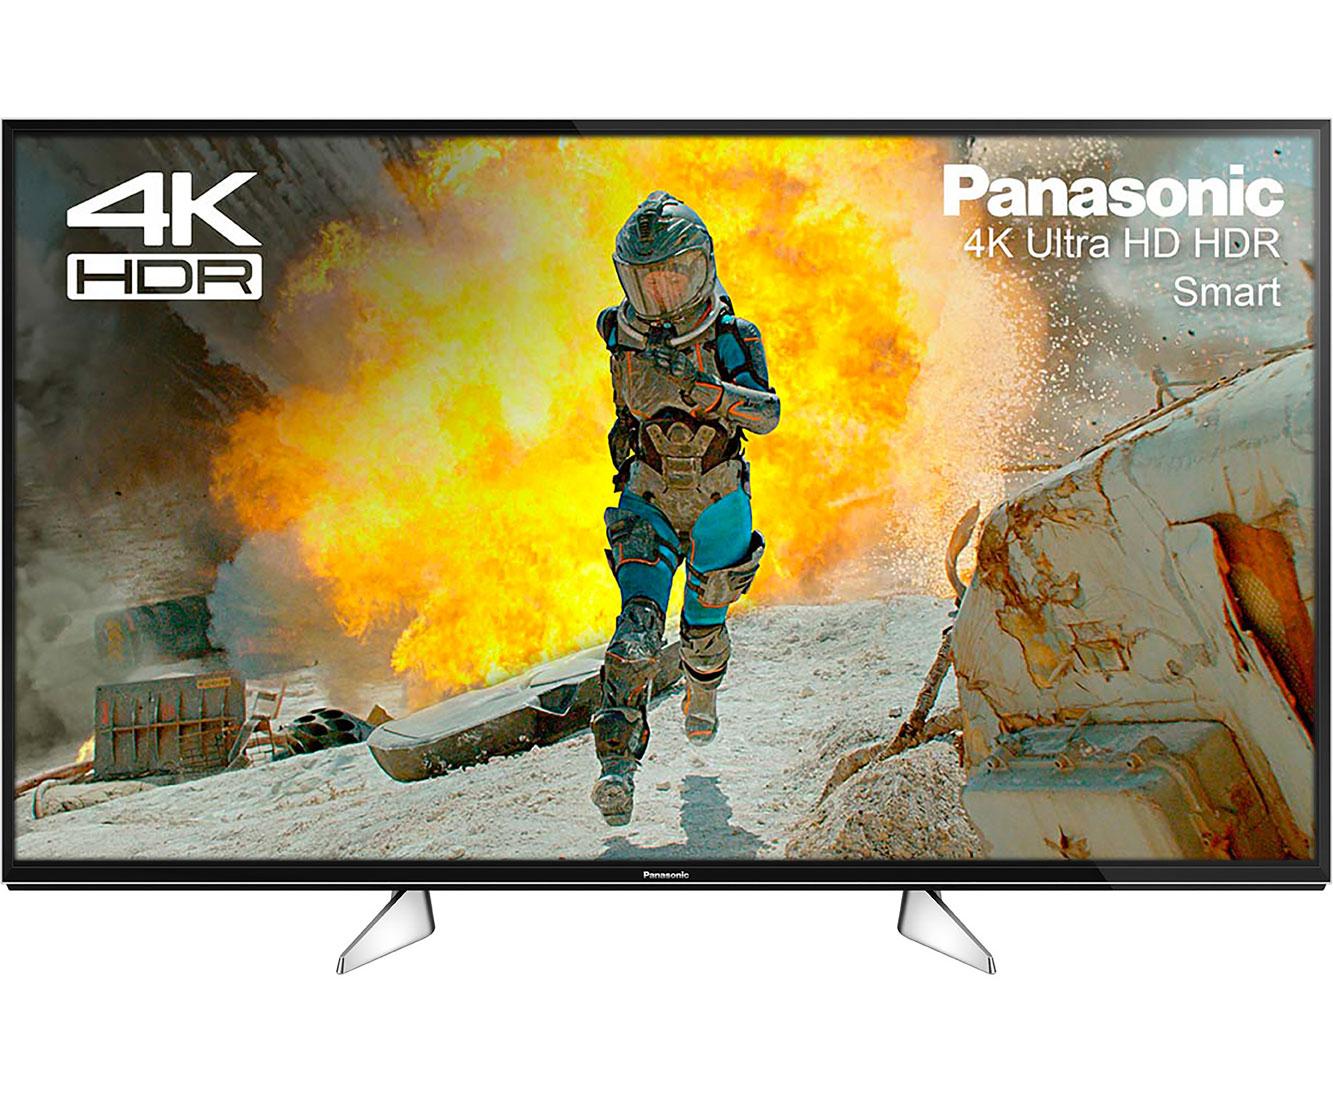 Panasonic Viera TX-65EXW604  4K Ultra HD TV